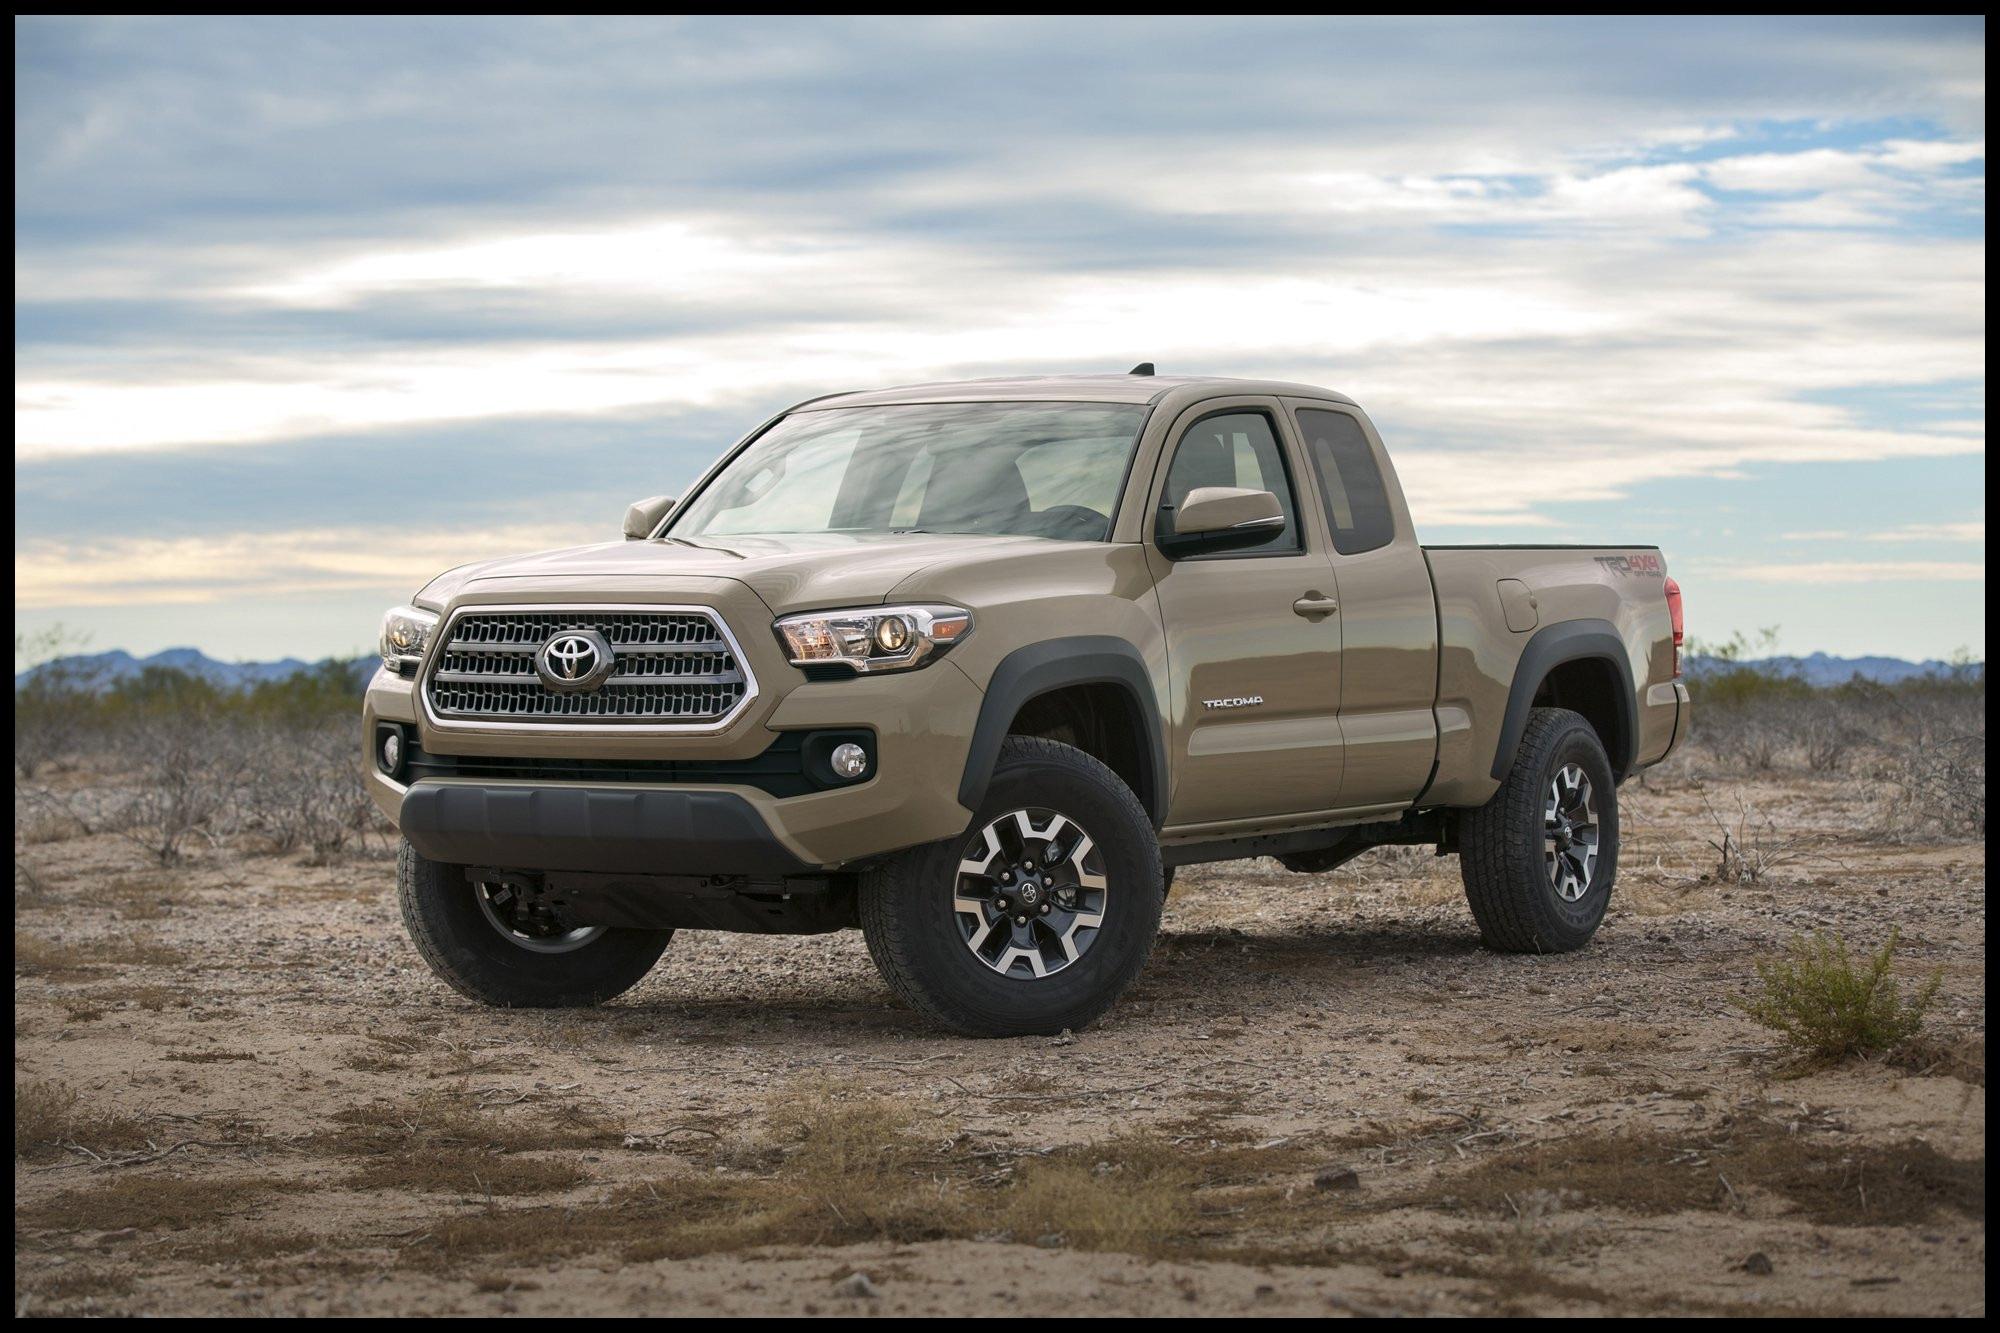 Hot News 2019 toyota Ta A Build New New 2019 toyota Tundra Truck Carmodel Concept